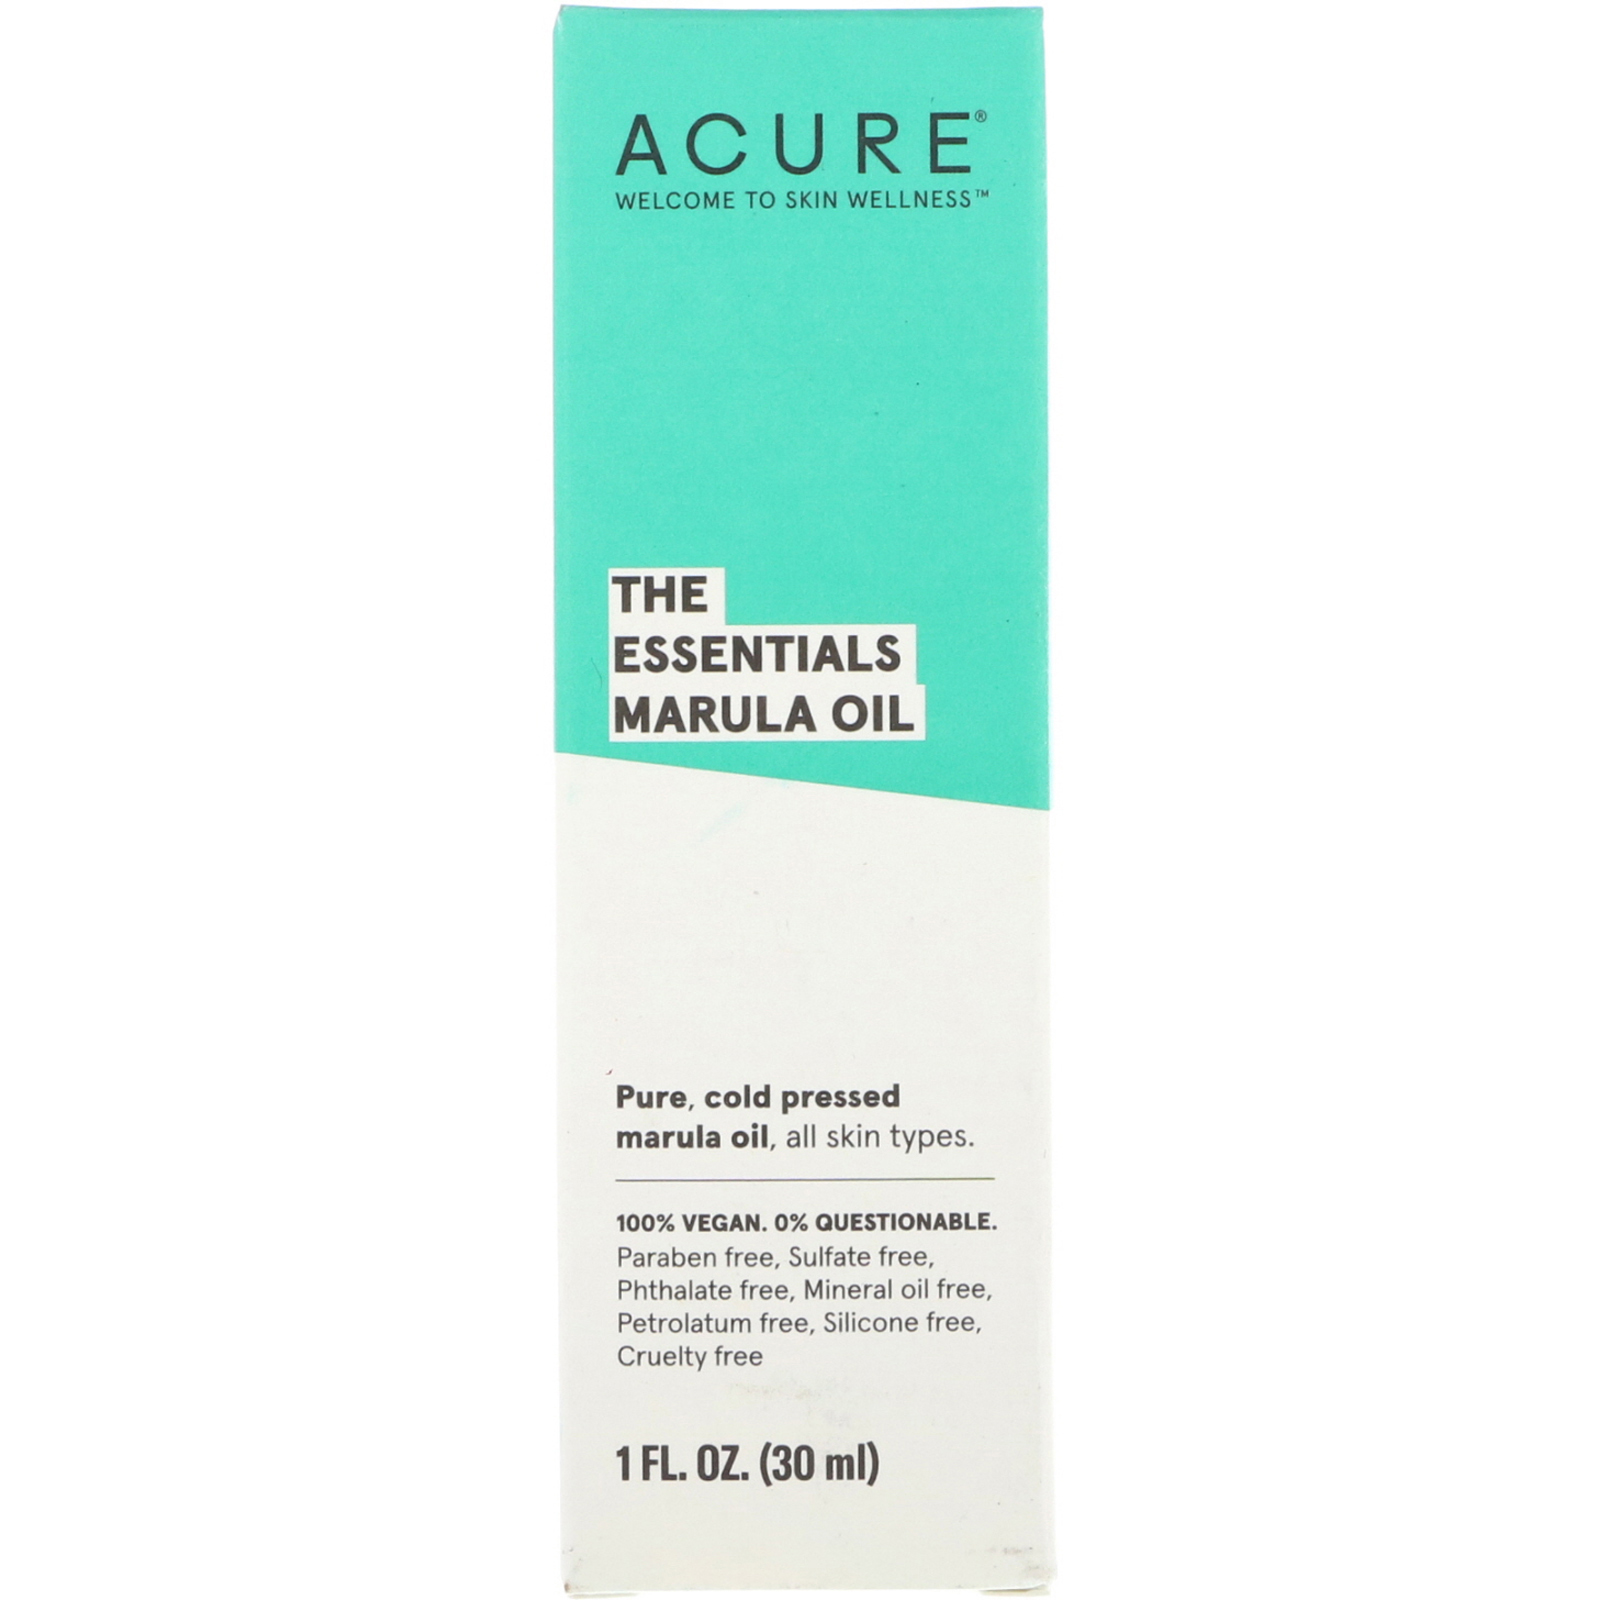 Acure Organics The Essentials Marula Oil 1 Fl Oz 30 Ml